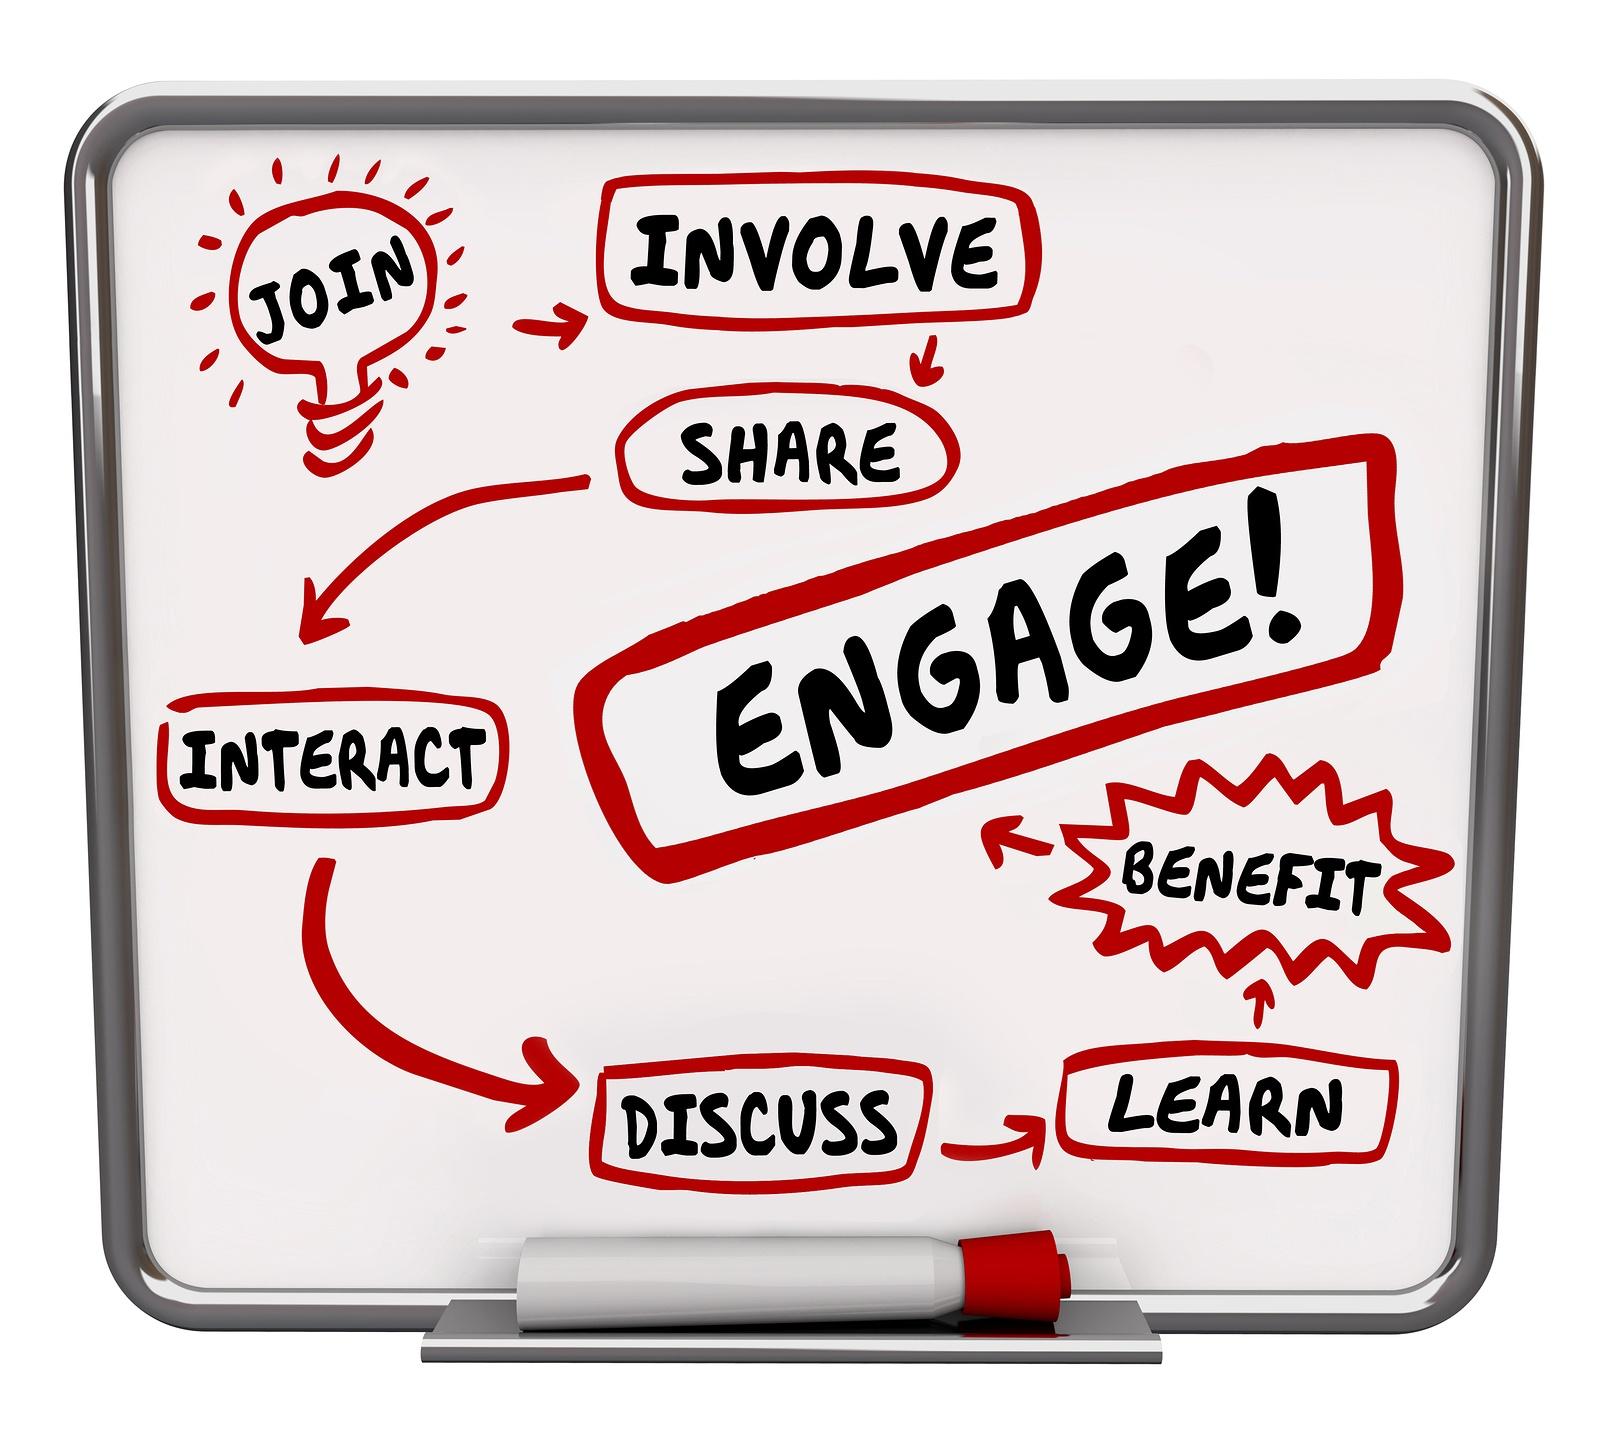 engagement-local-internet-marketing.jpg